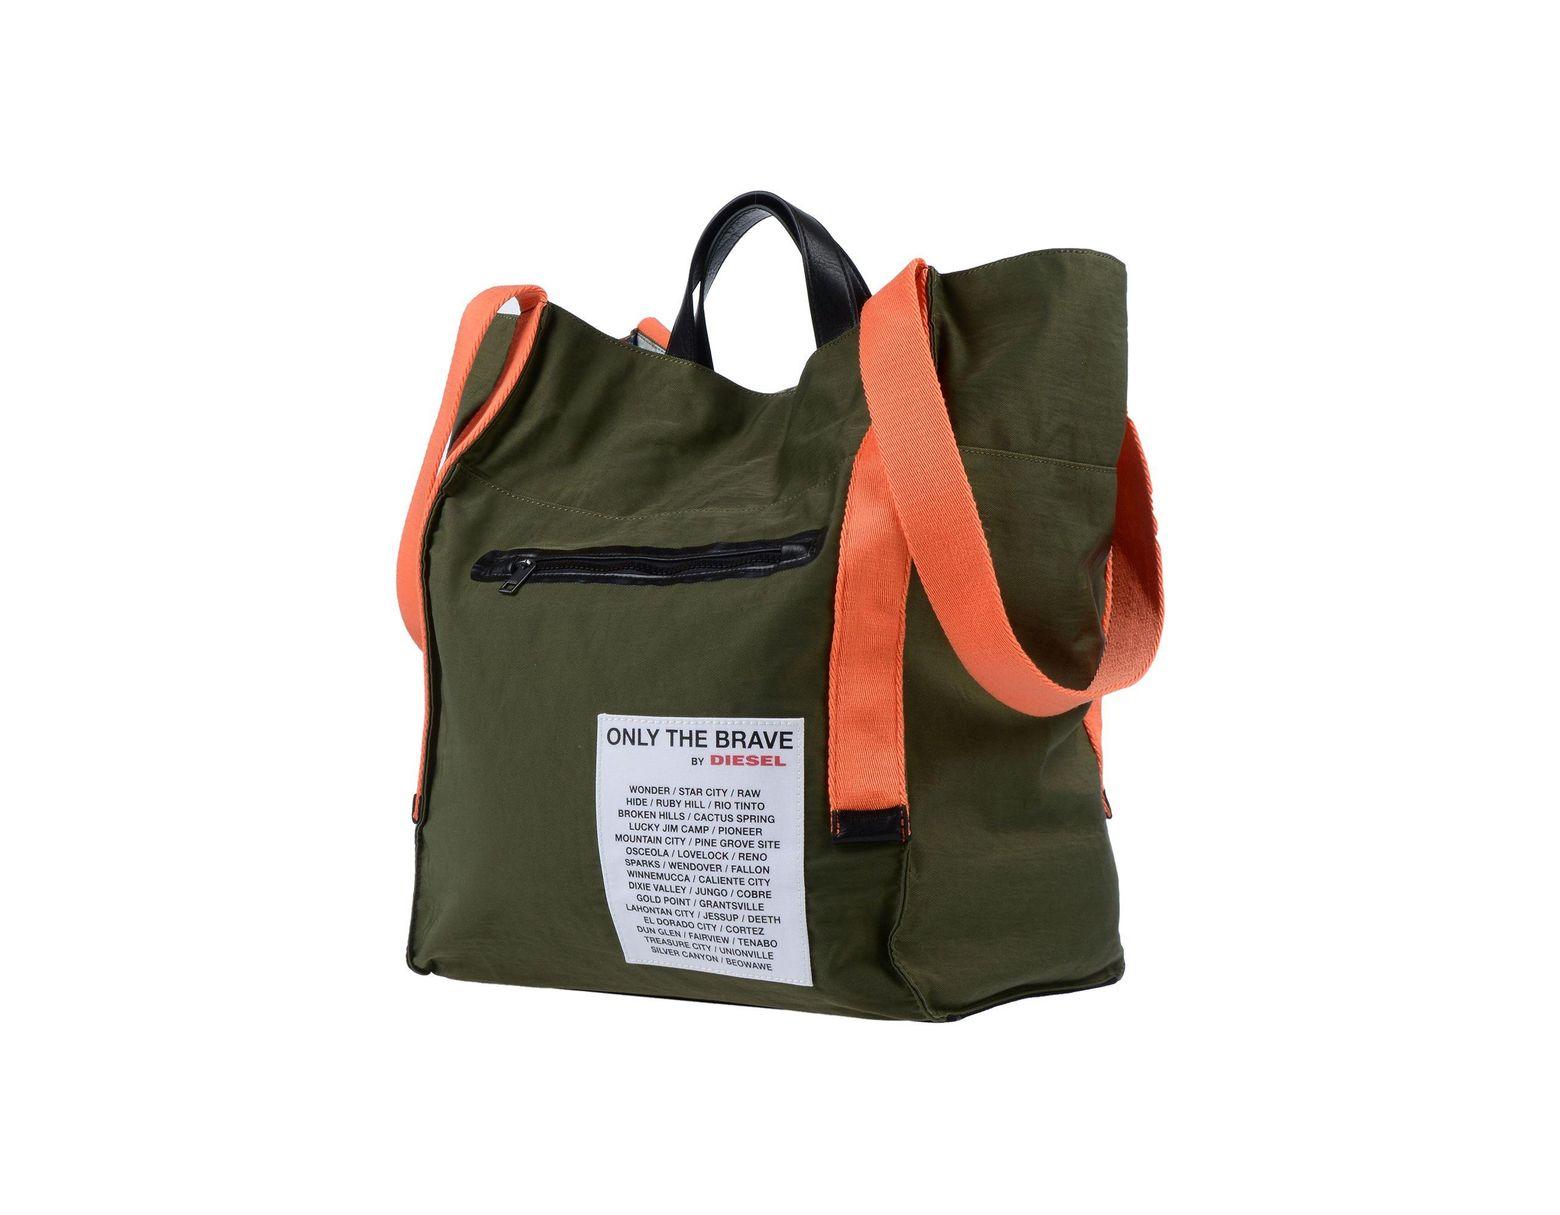 b31c7e7f6598 DIESEL Backpacks & Bum Bags in Green for Men - Lyst